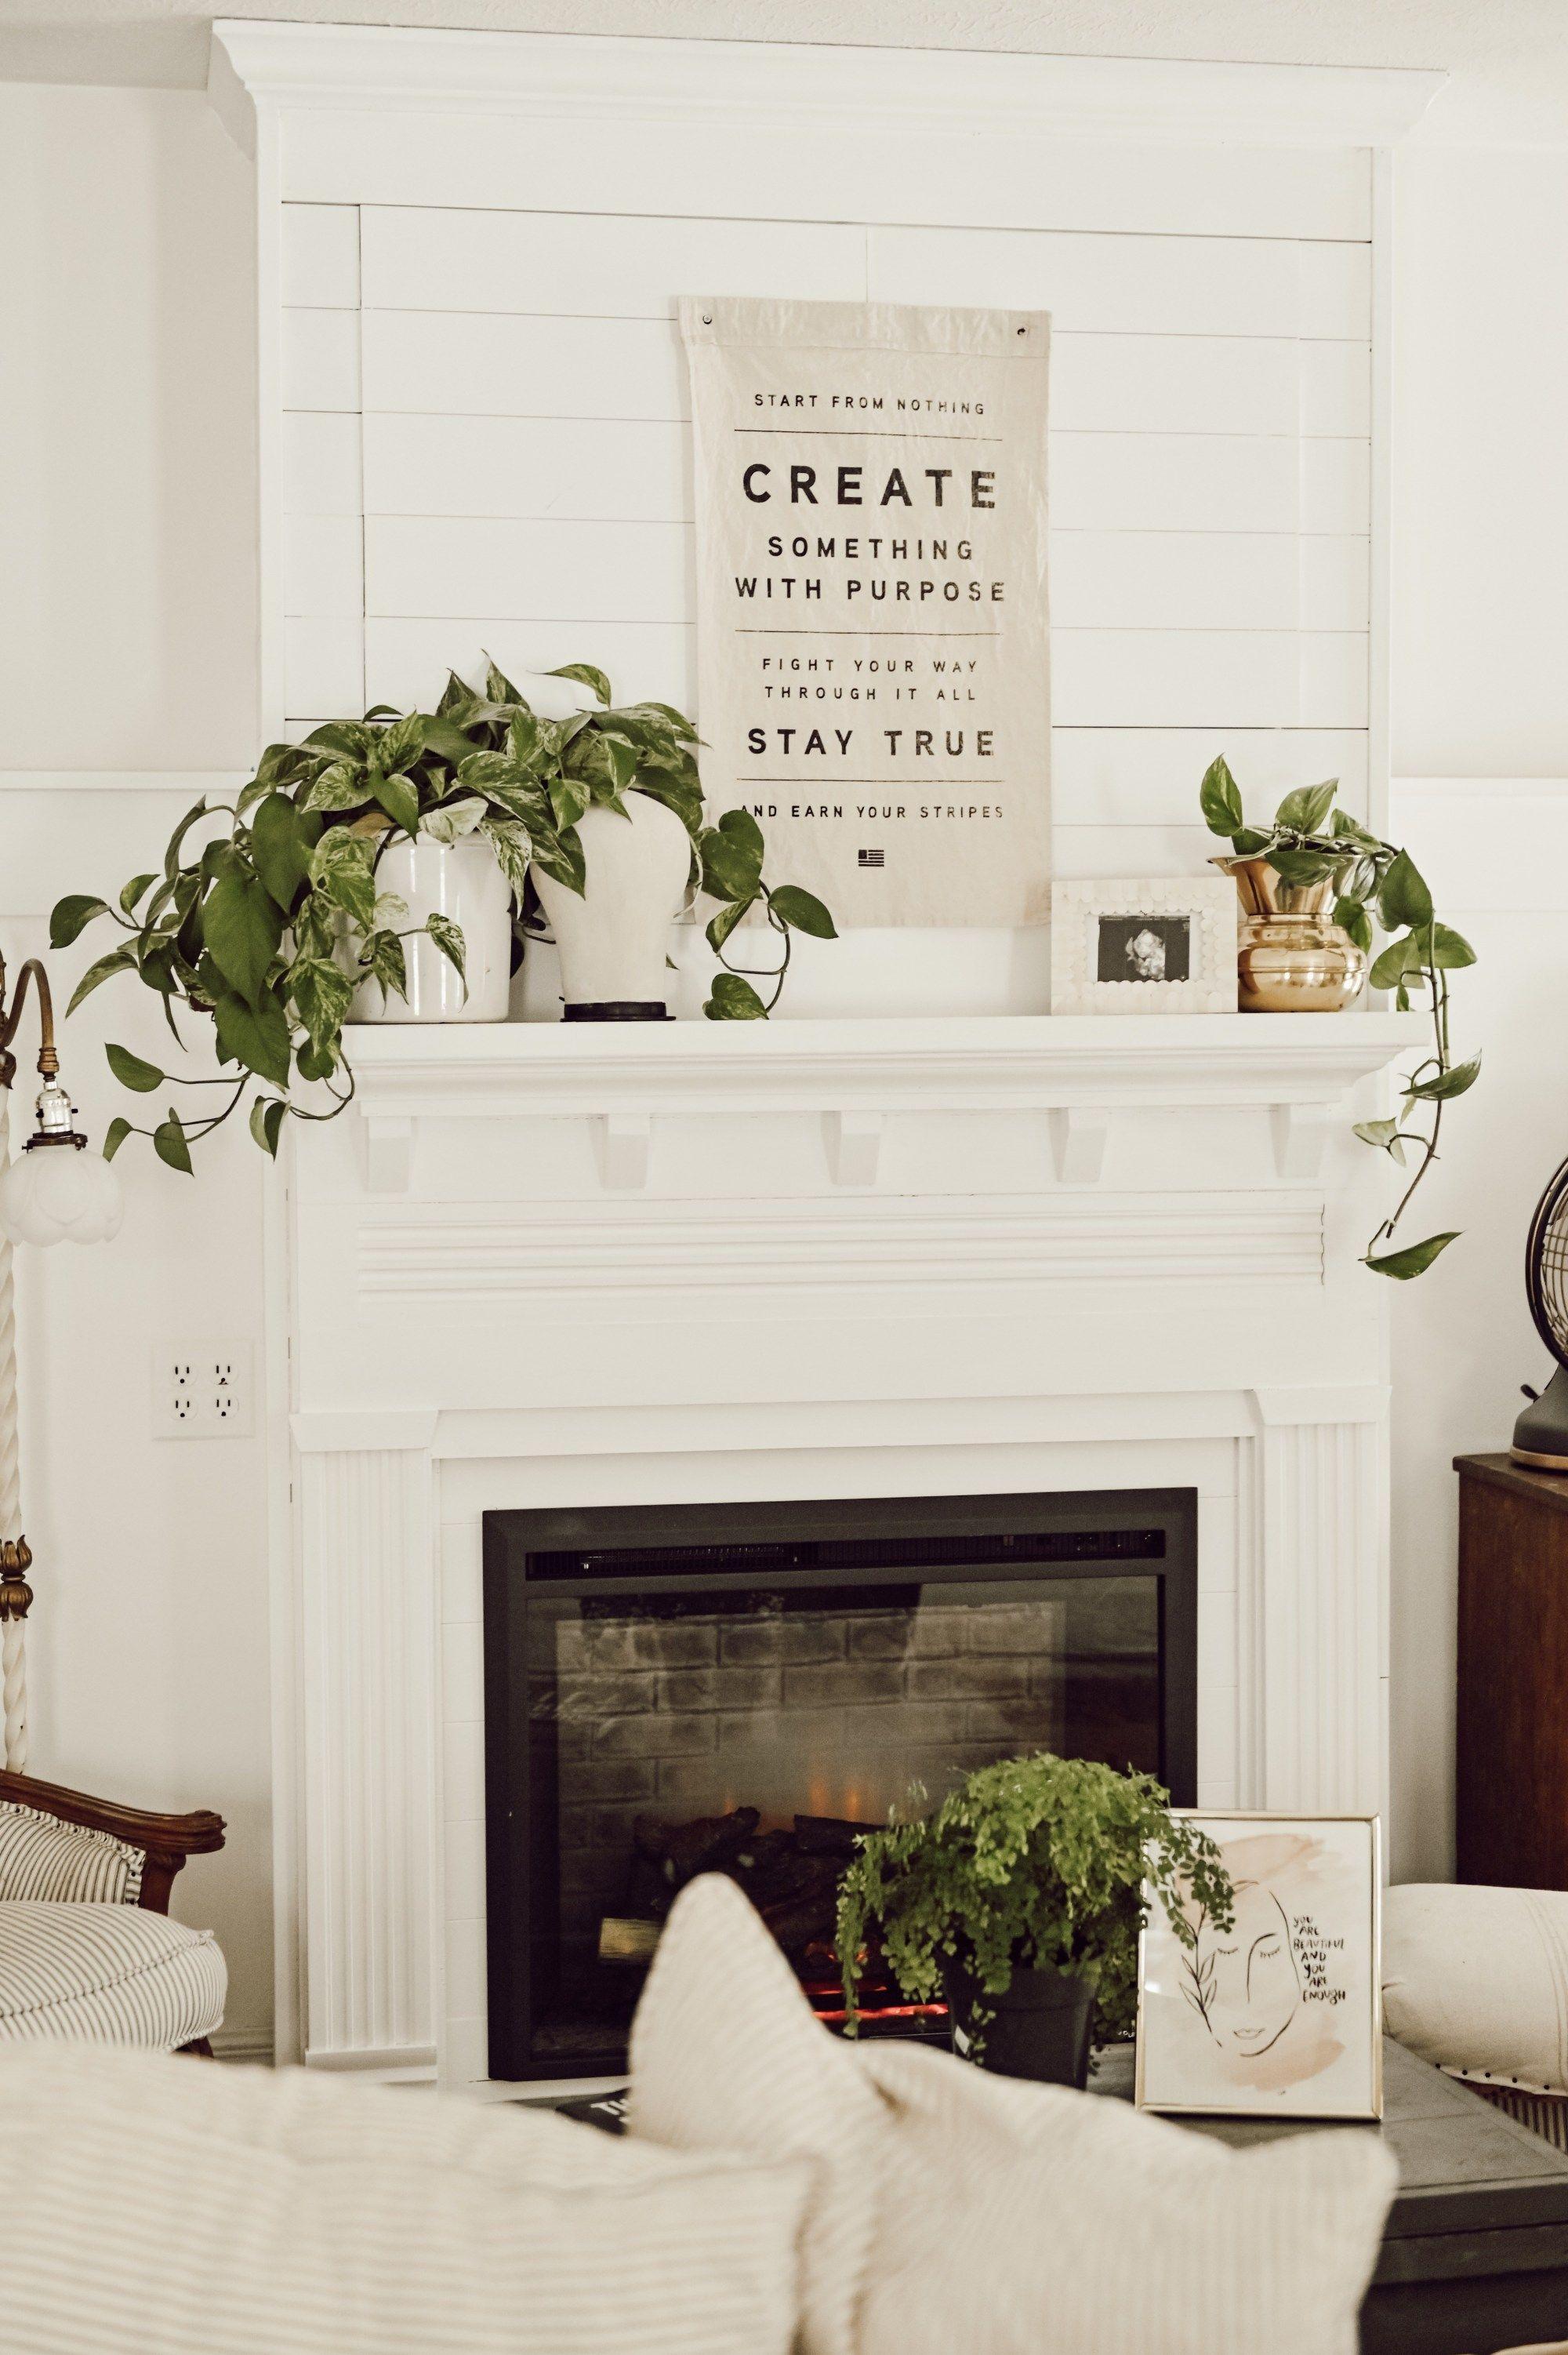 Diy Built In Electric Fireplace Diy Fireplace Diy Fireplace Mantel Built In Electric Fireplace